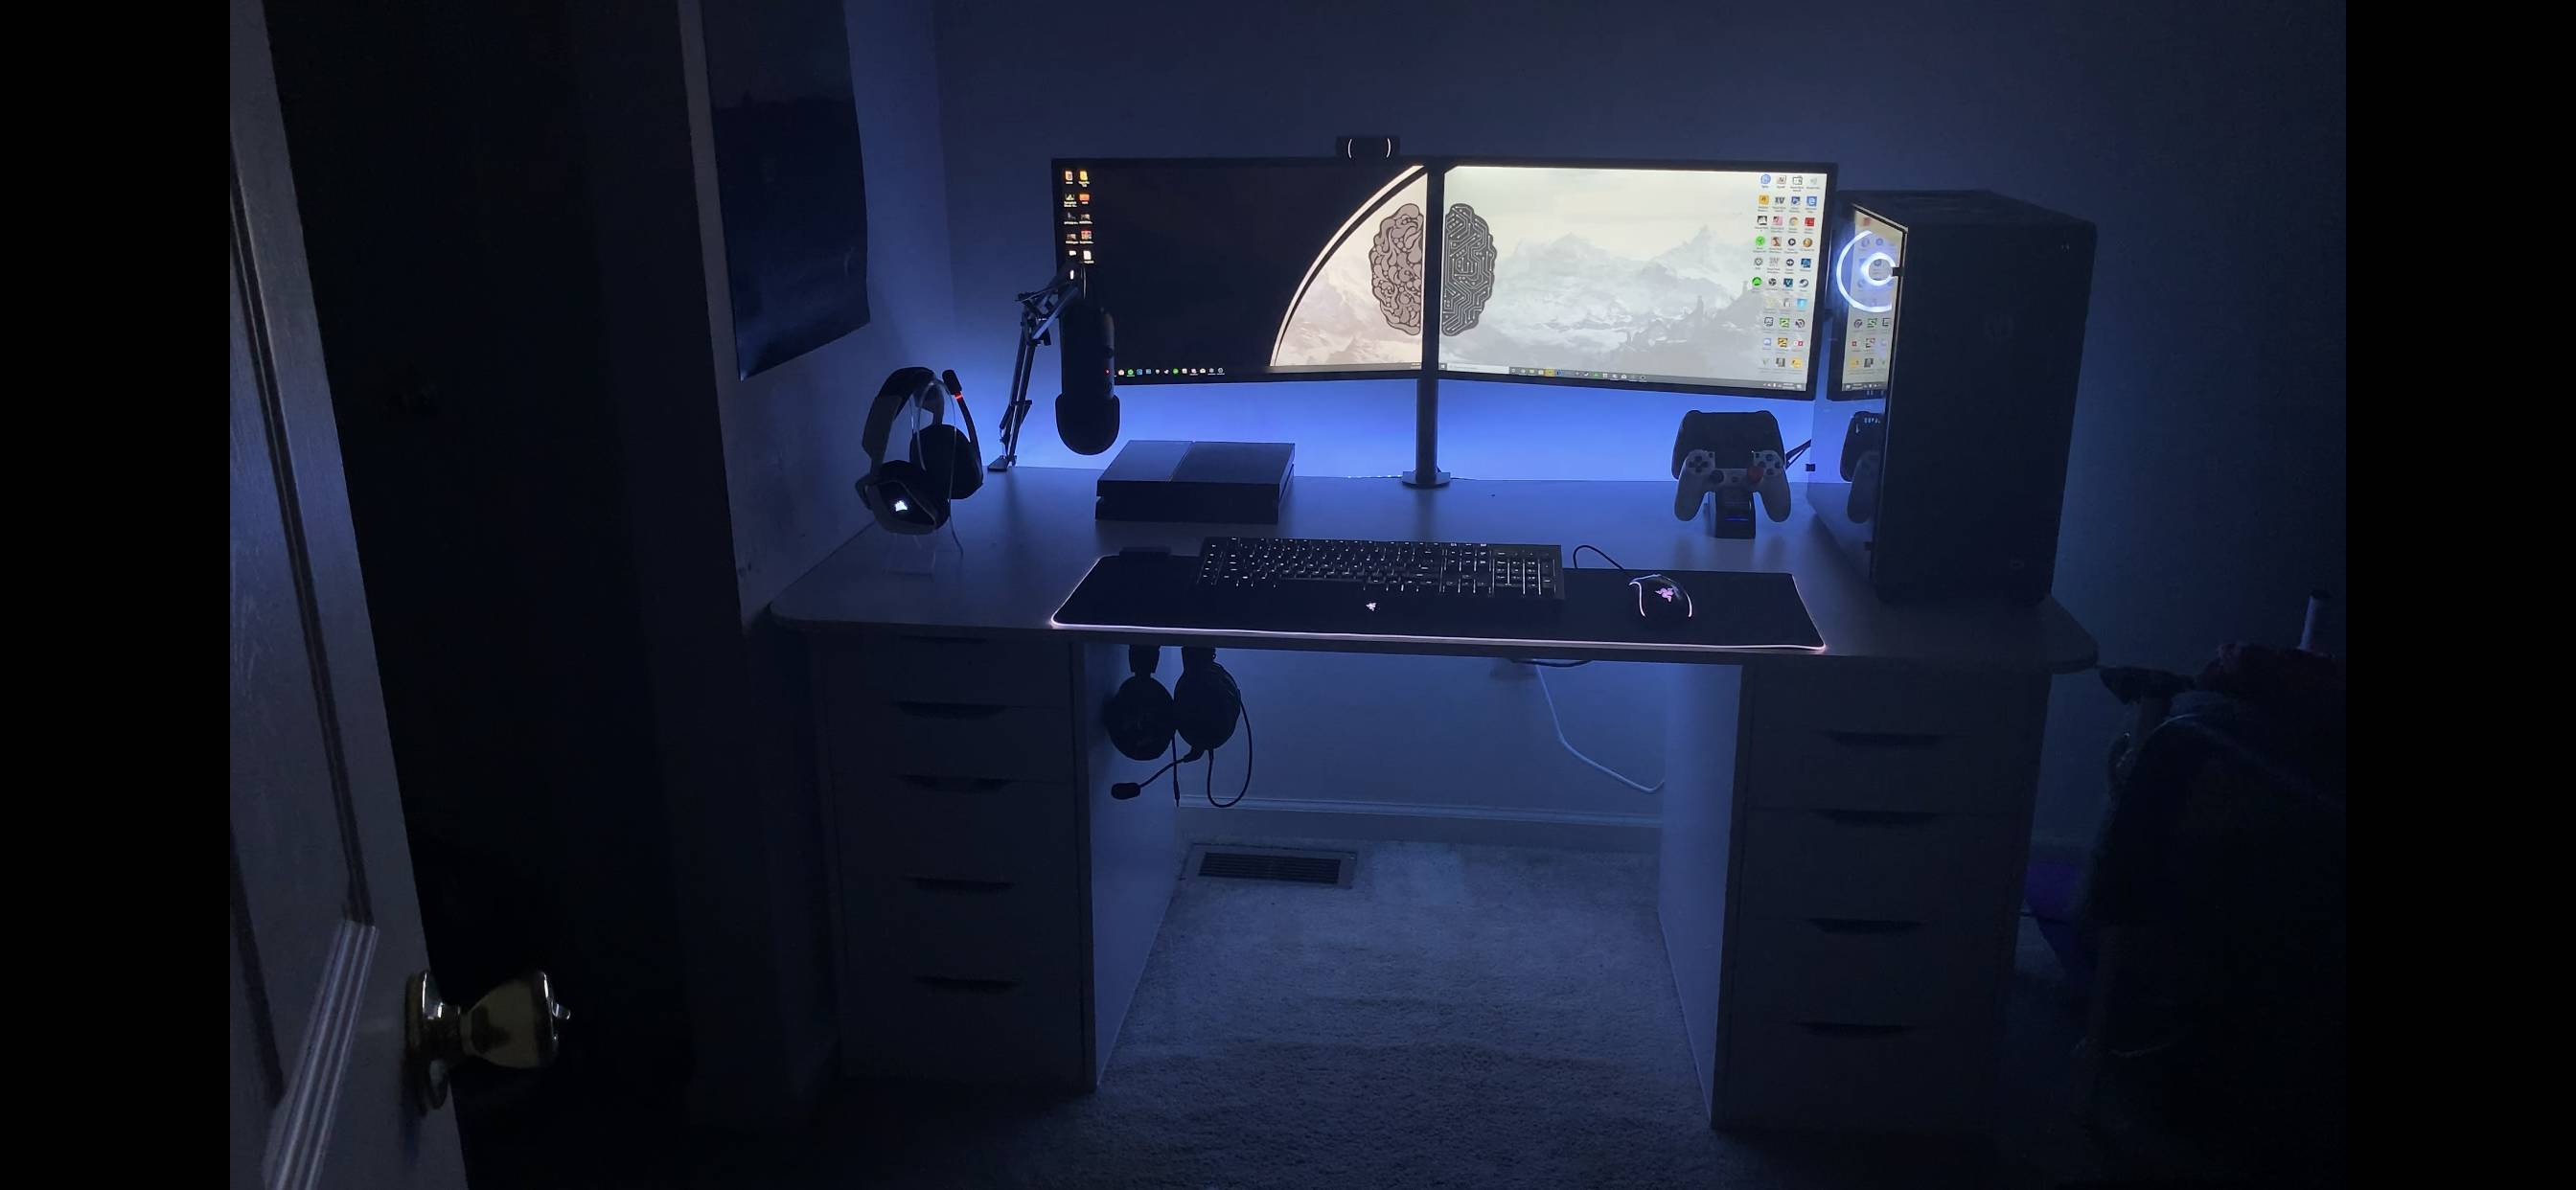 HeatRun's Setup - Frost White Setup | Scooget